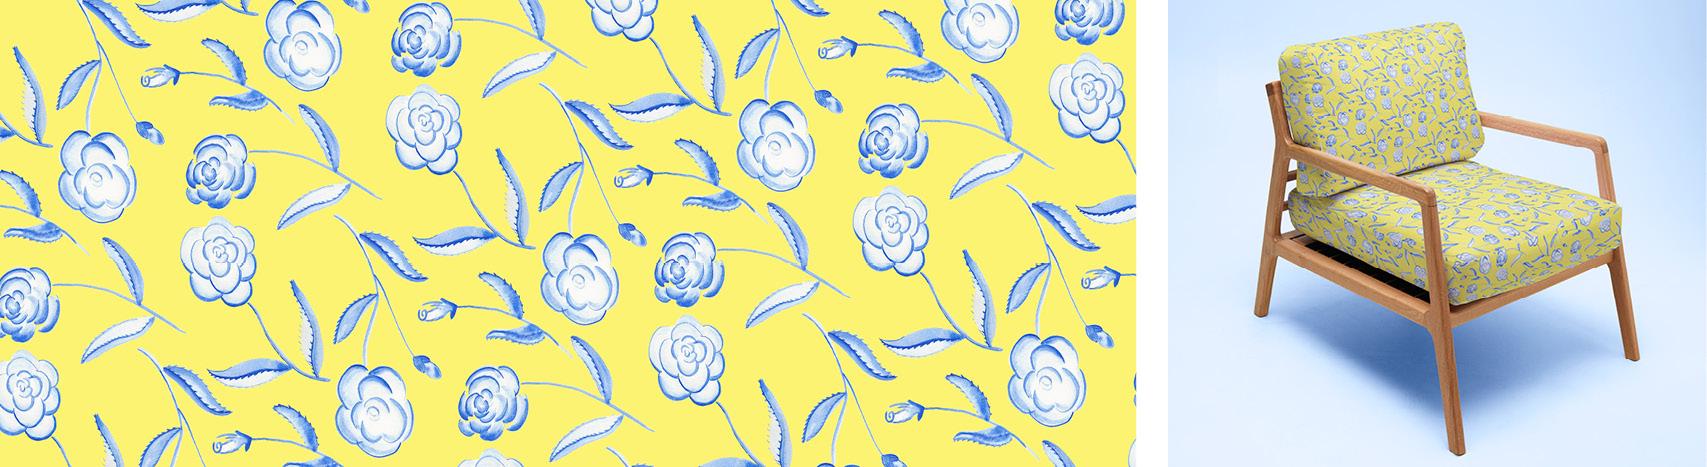 motif roses Florie Nguyen Van